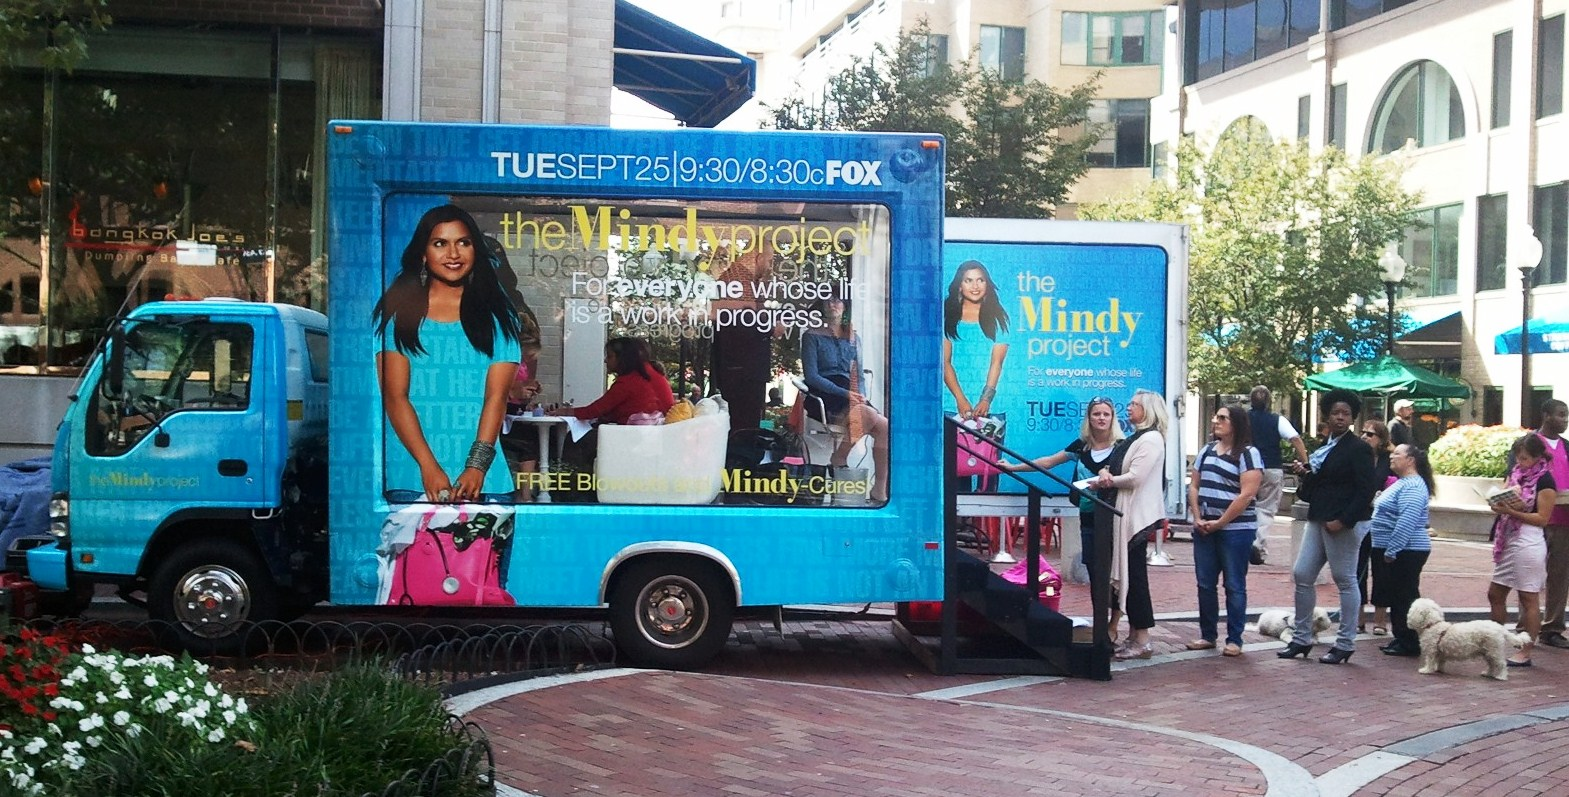 Mobile Billboard Advertising With Bulldog Bulldog Mobile